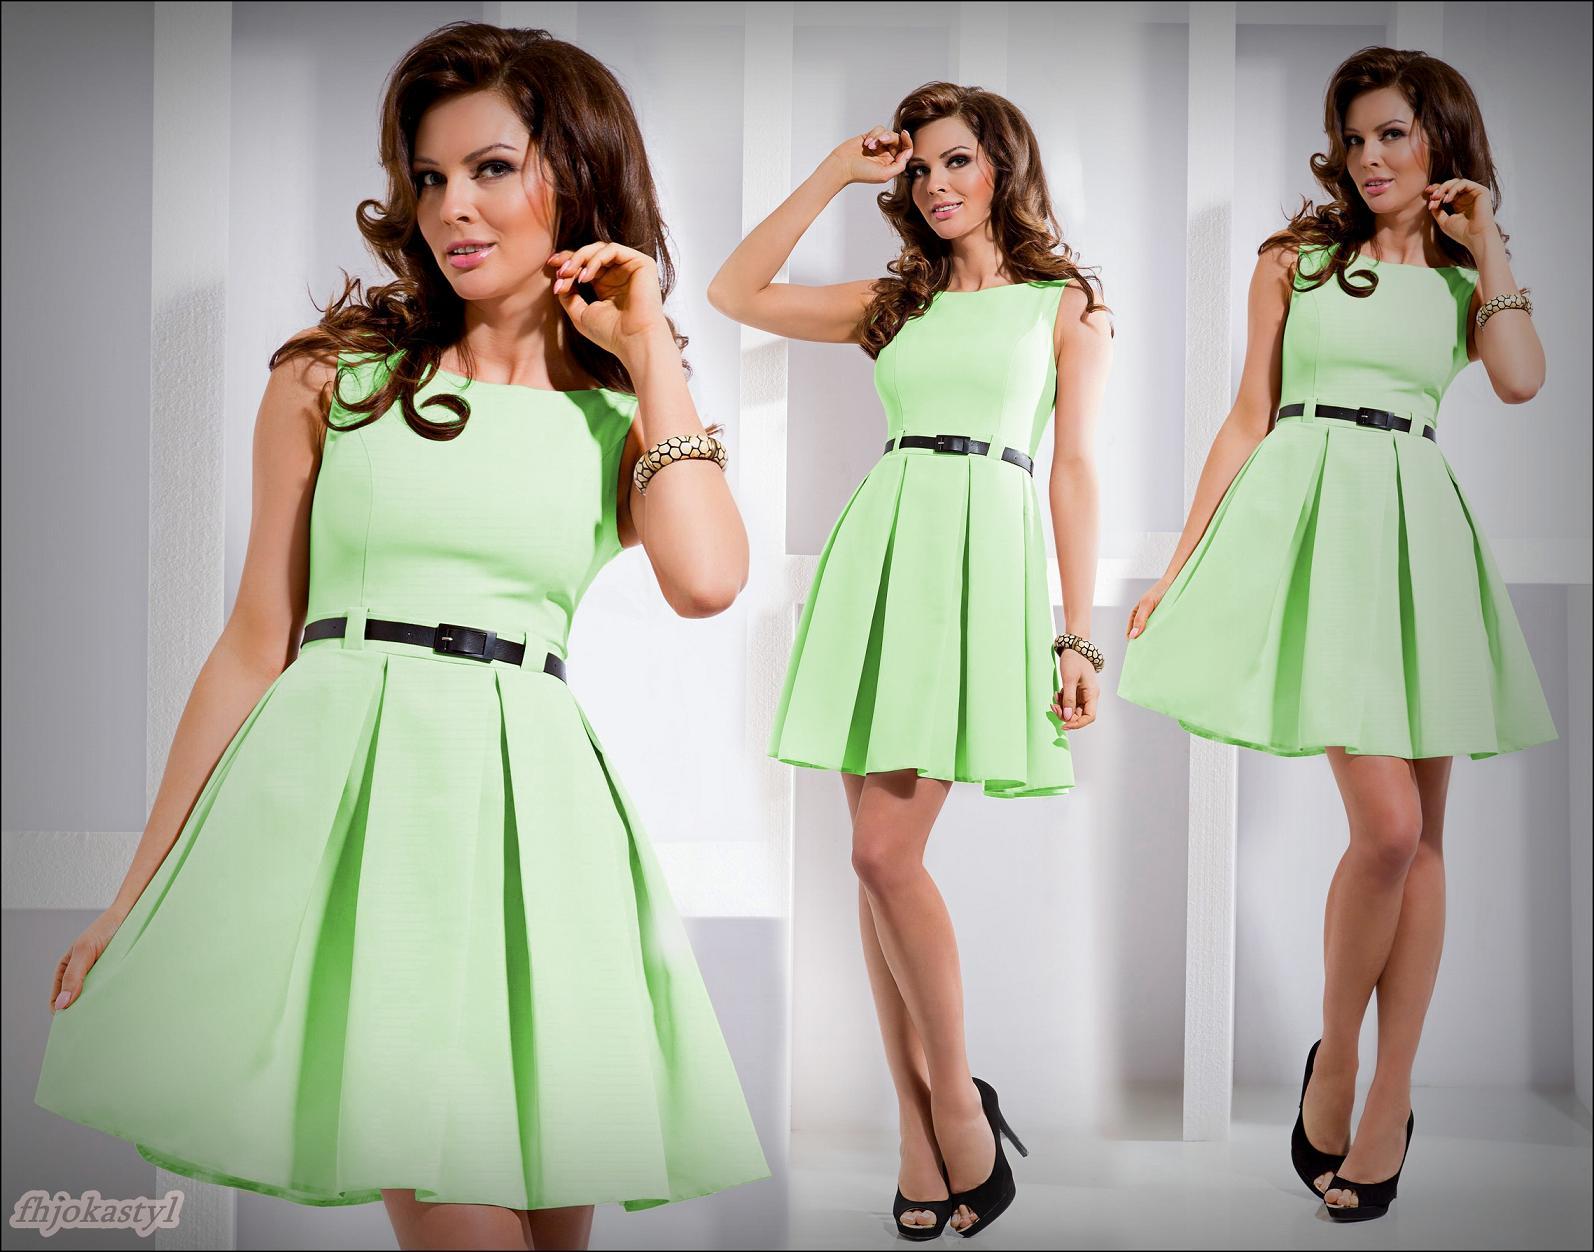 5e062581f0 jokastyl  Rozkloszowana sukienka miętowa S 36 na Bazarek.pl